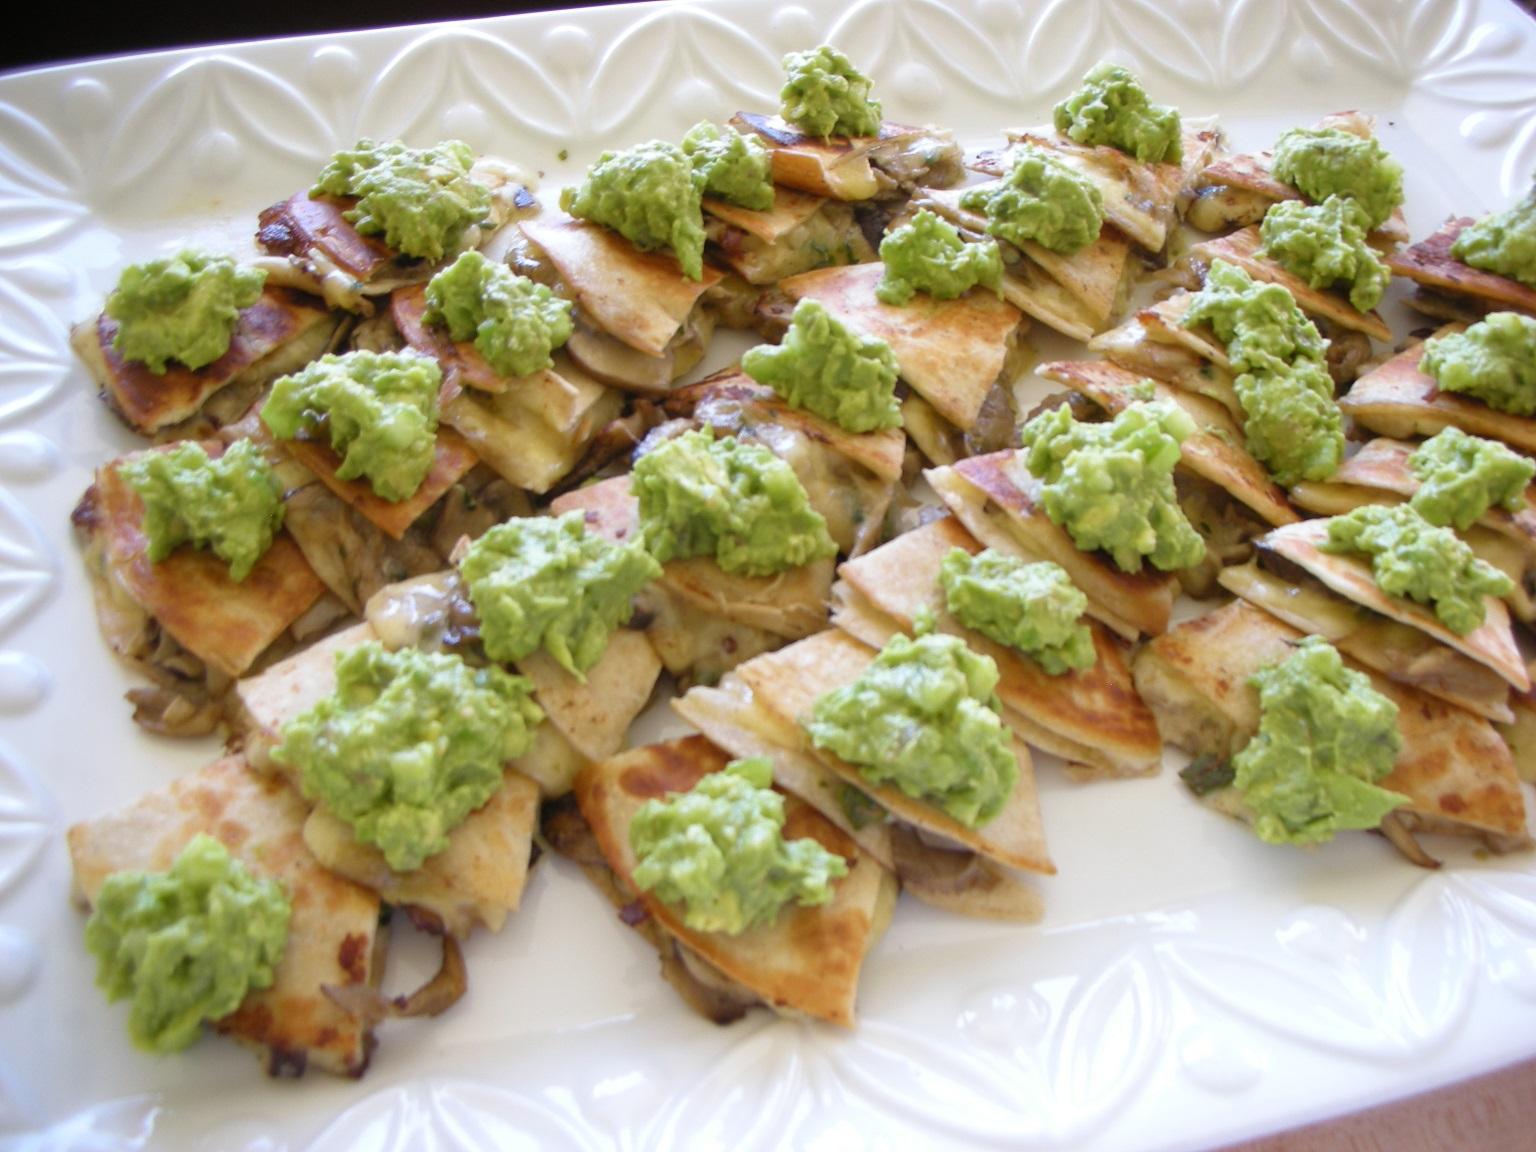 ... Mix recipe: Cheese & Mushroom Quesadillas - Heather's Florida Kit...